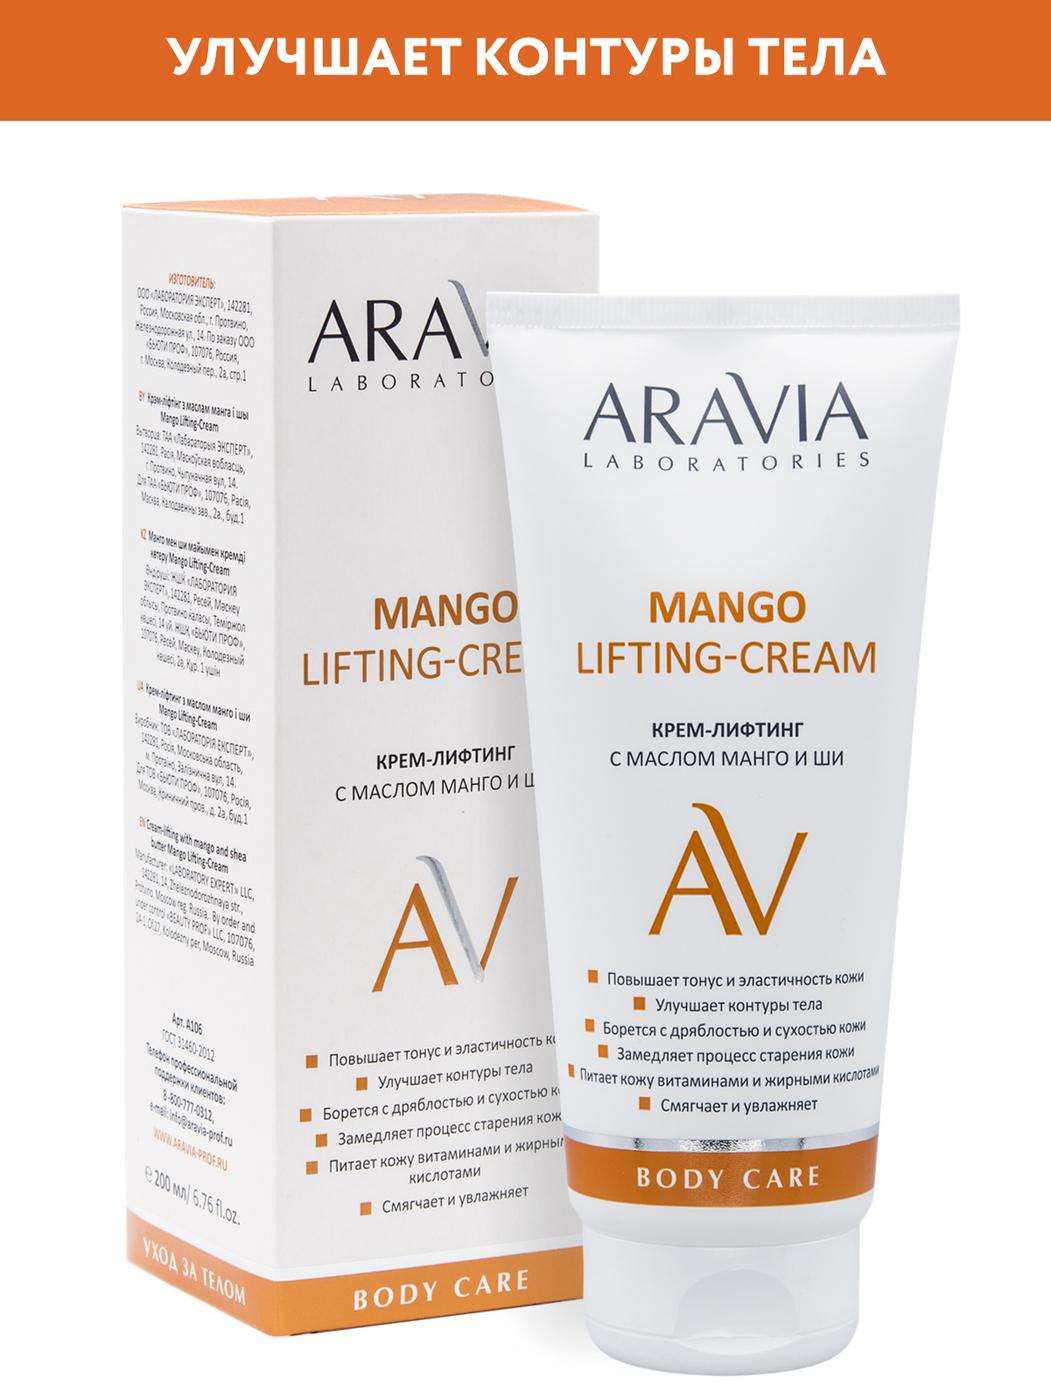 ARAVIA Laboratories Крем-лифтинг с маслом манго и ши Mango Lifting-Cream, 200 мл